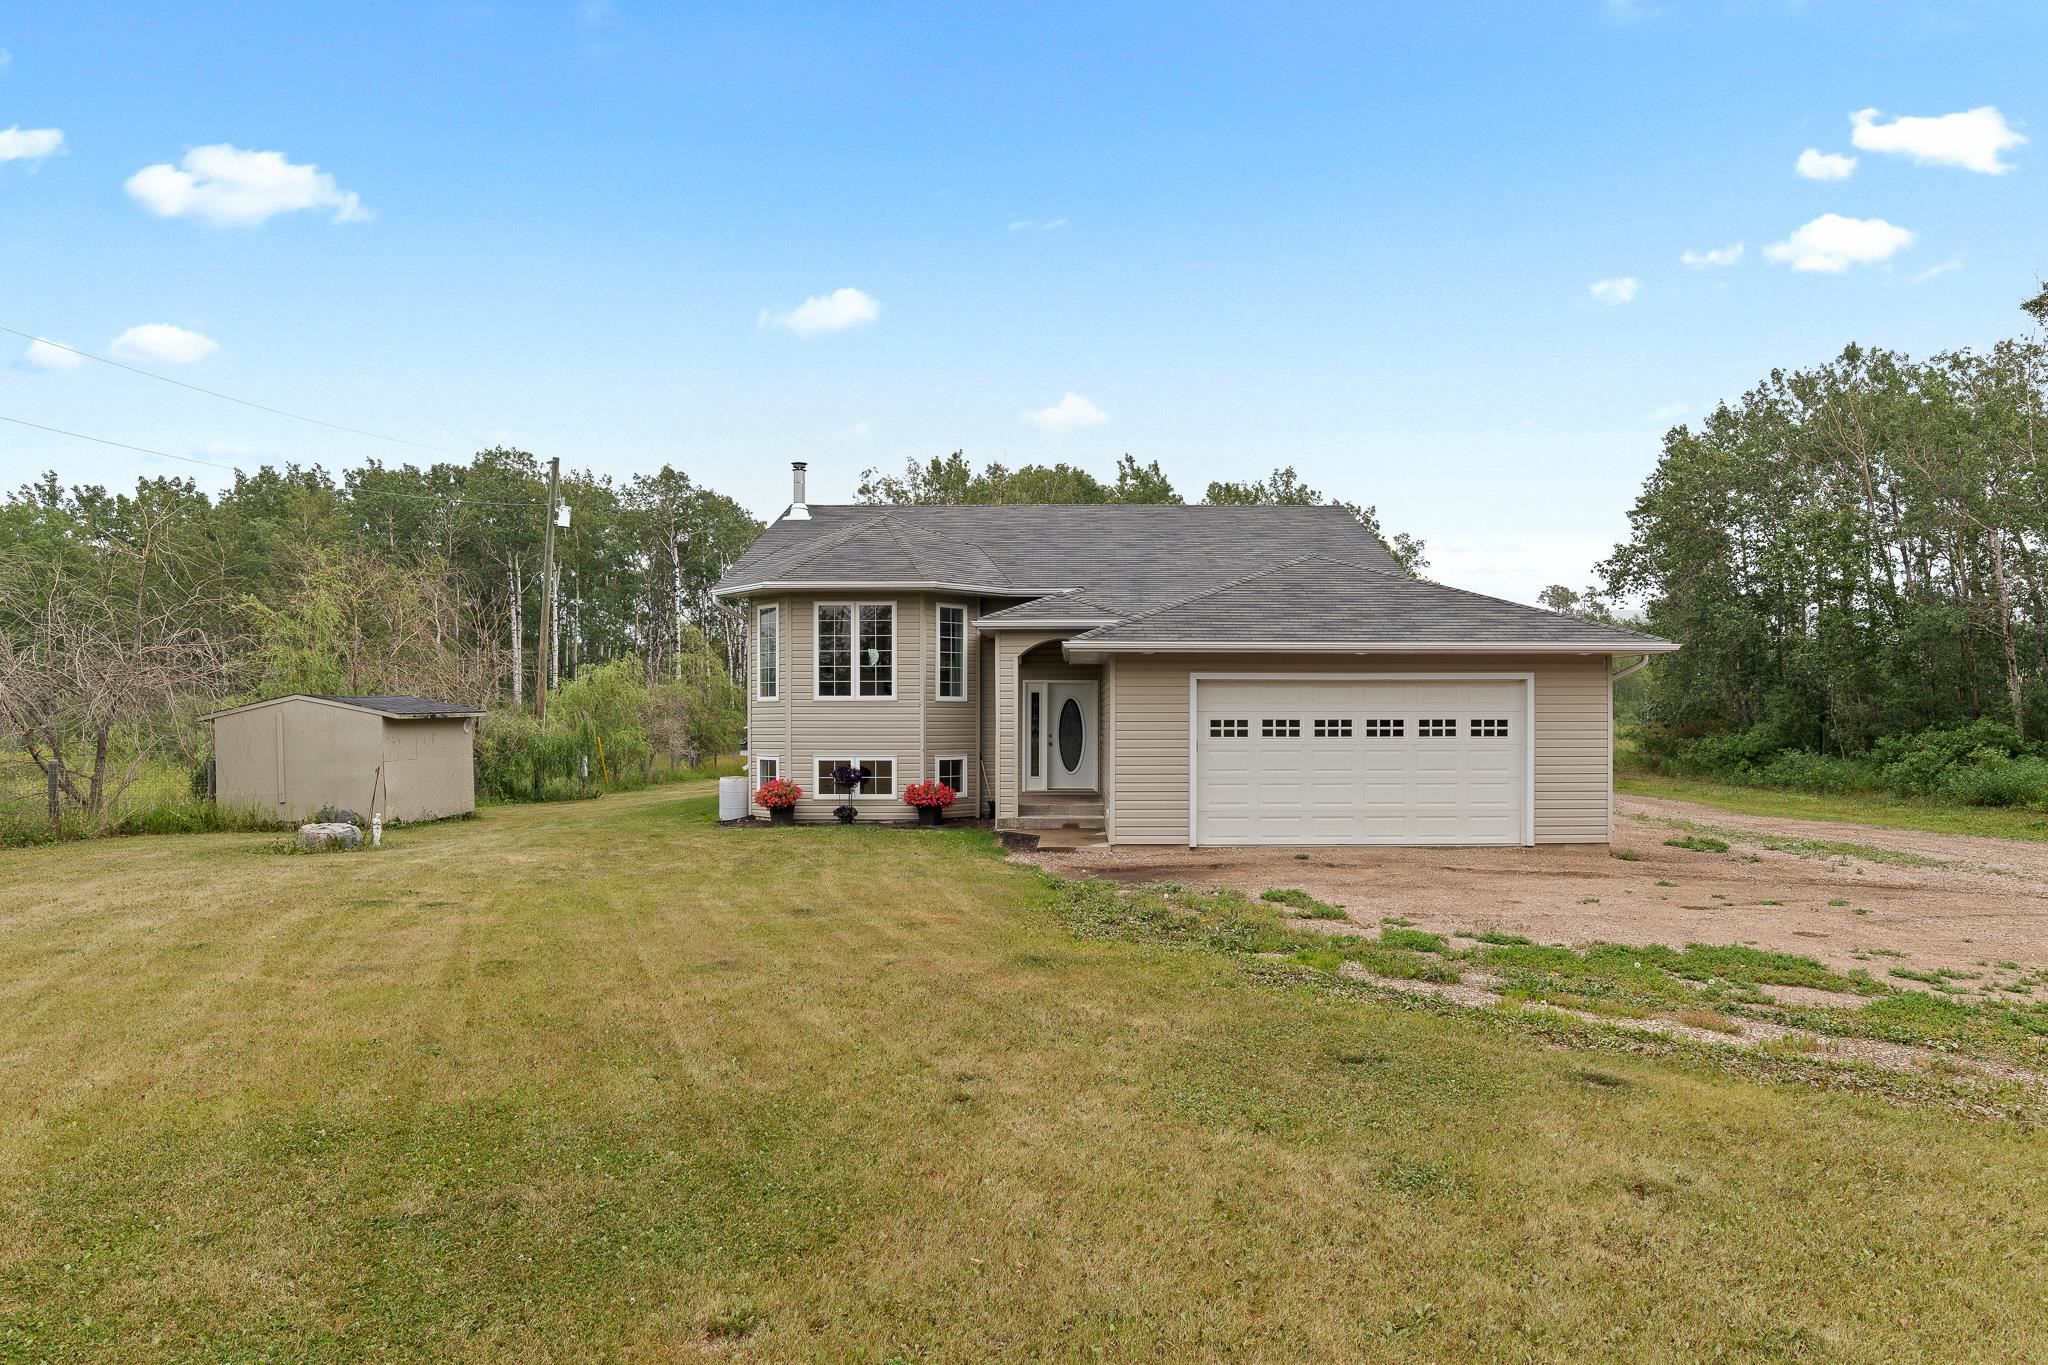 Main Photo: 62221 Rge Rd 424: Rural Bonnyville M.D. House for sale : MLS®# E4258832